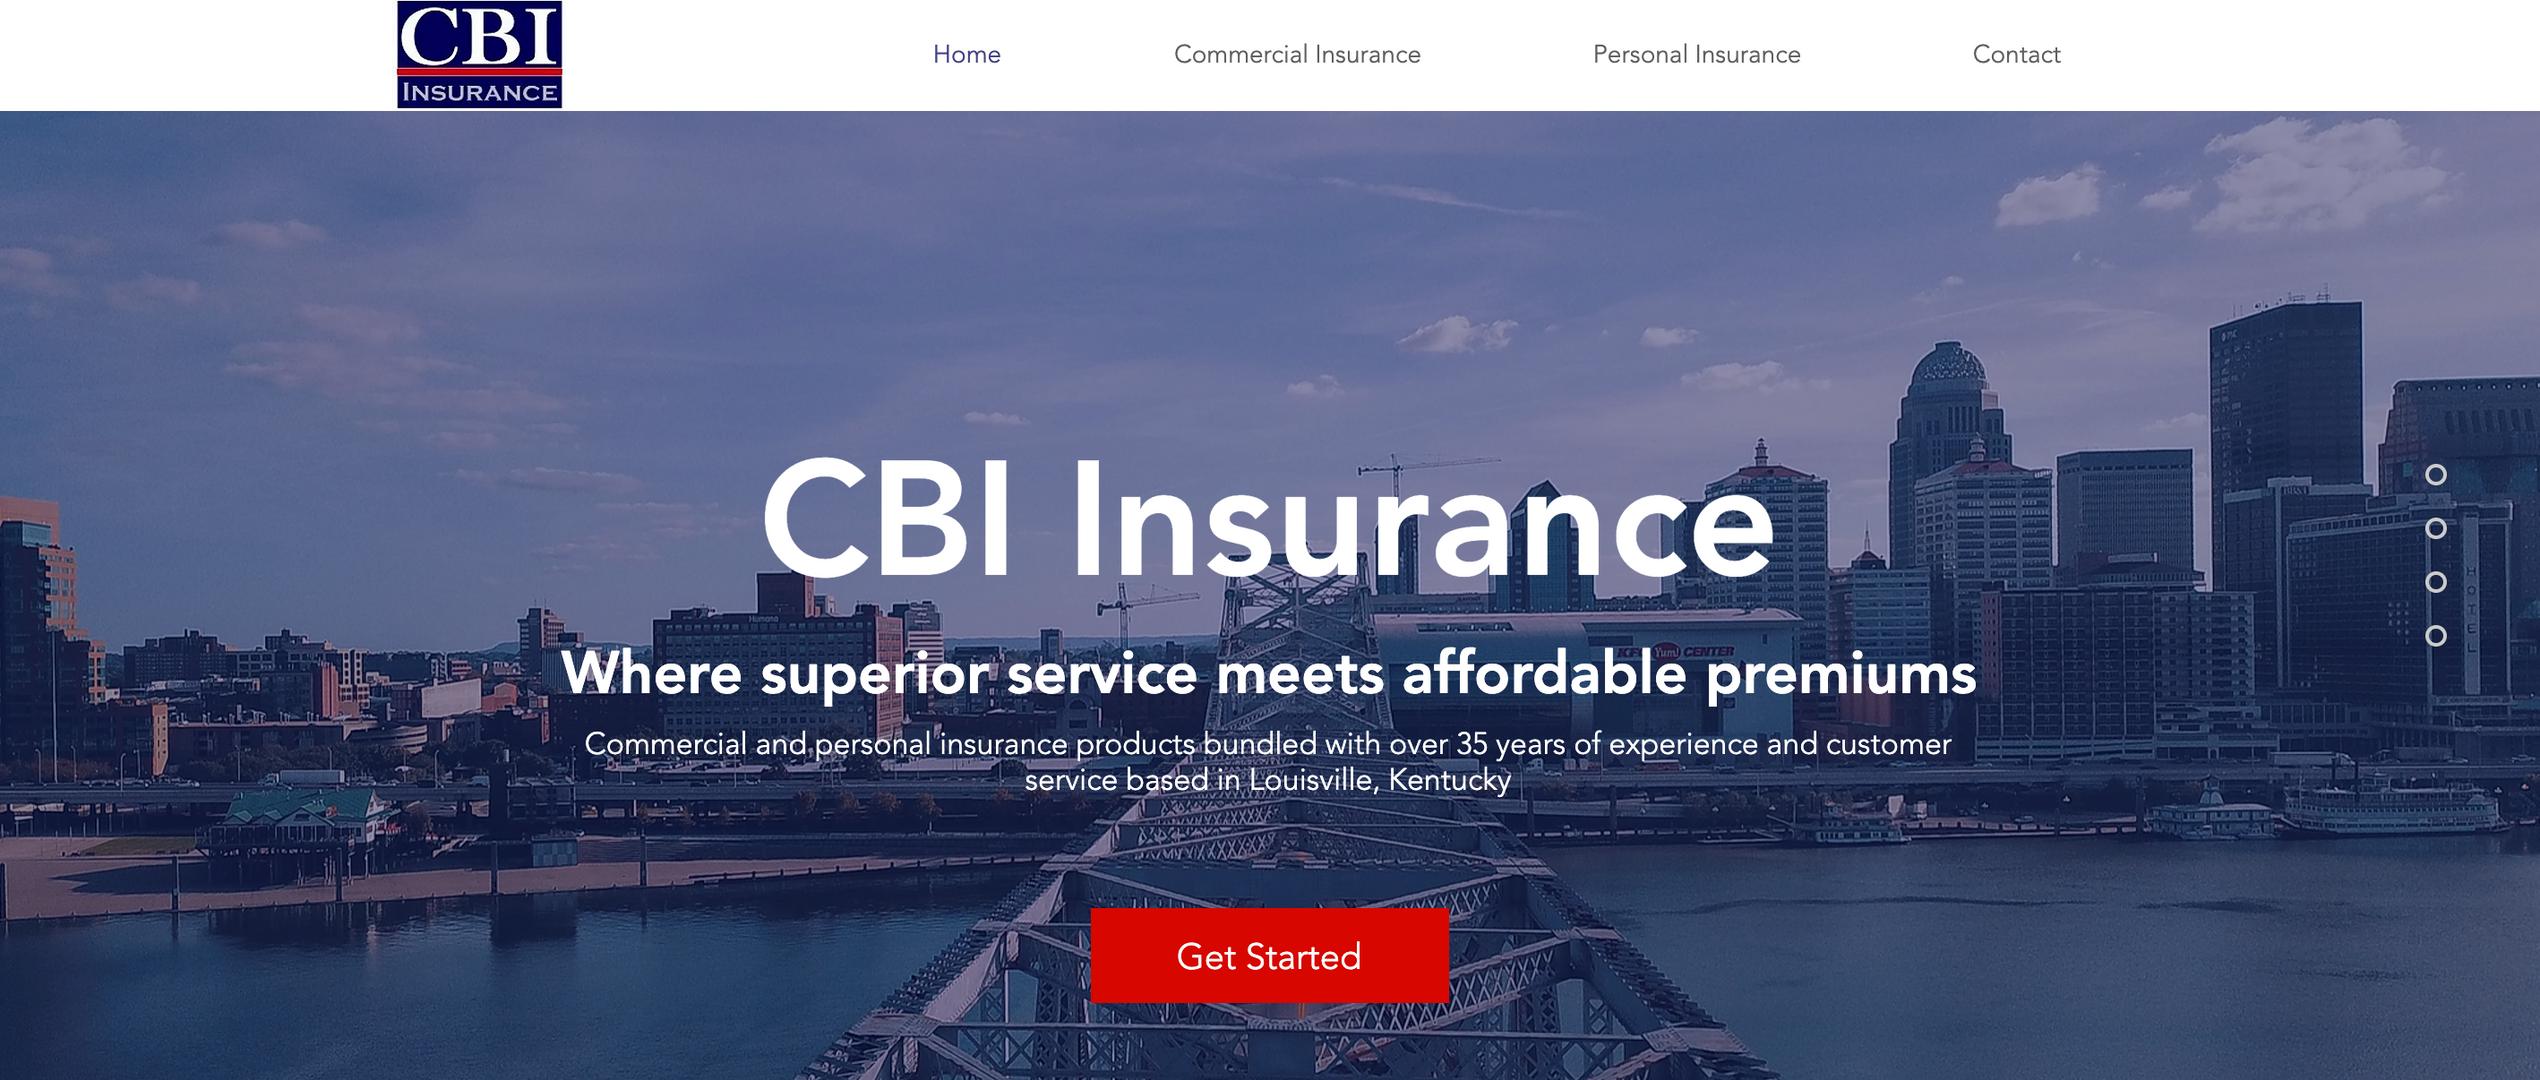 CBI Insurance